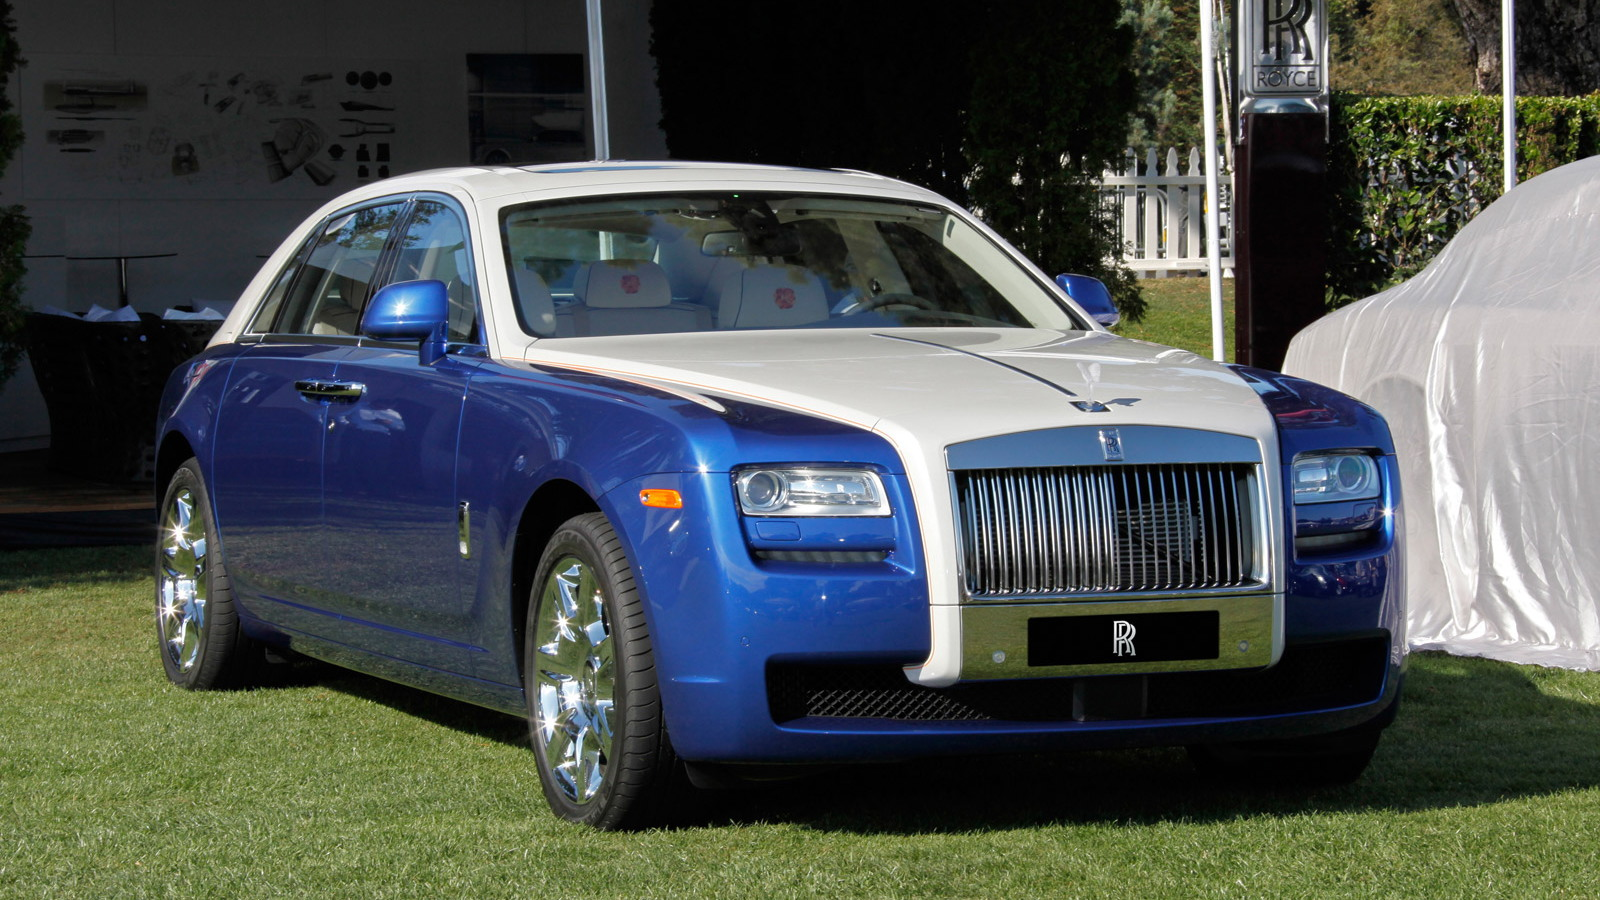 Bespoke 2013 Rolls-Royce Ghost at 2012 Pebble Beach Concours d'Elegance